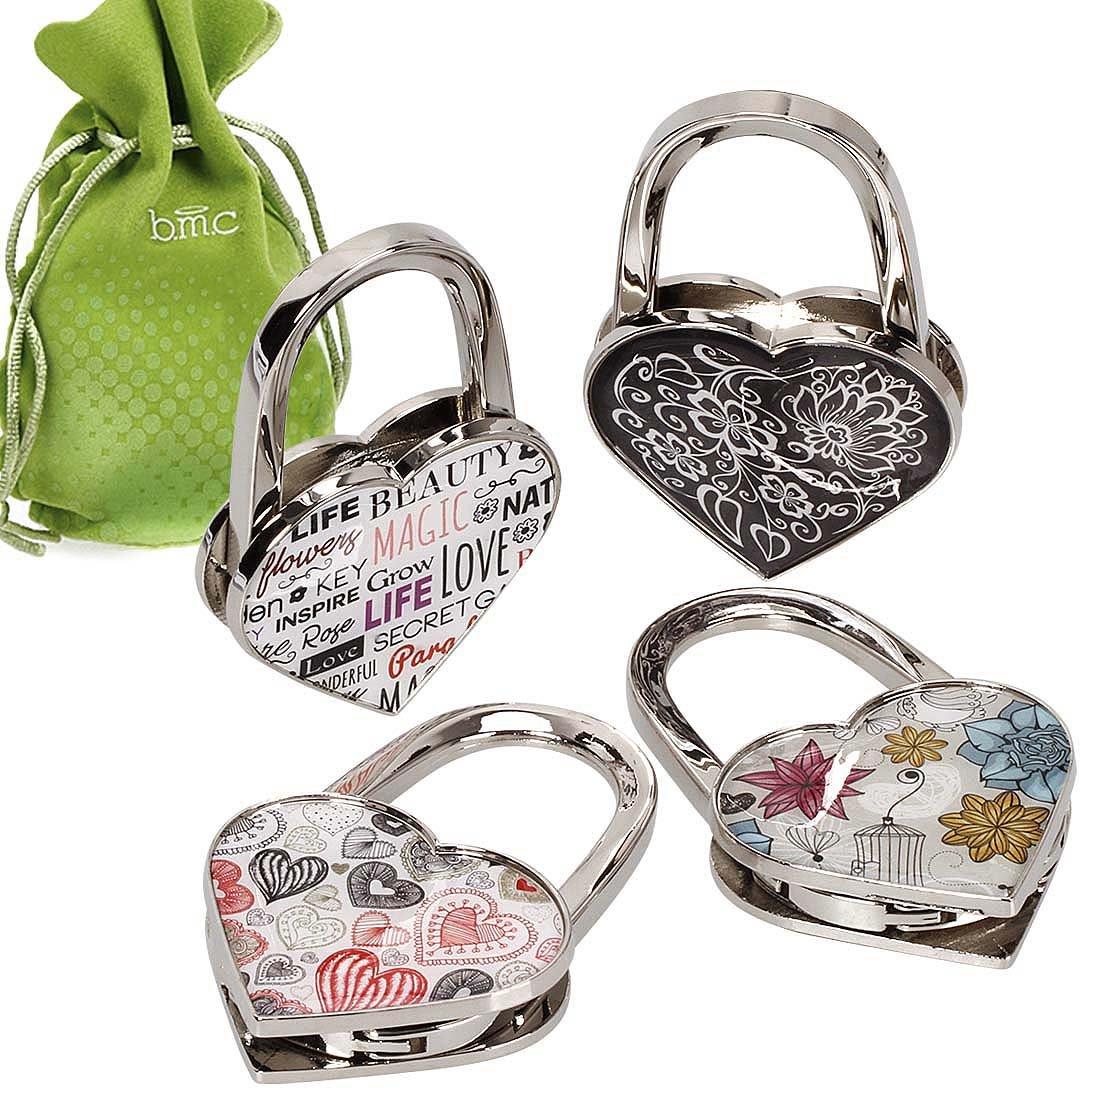 BMC 4pc Theme Designed Shoulder Handbag Folding Purse Holder Hangers Hooks Set - Swirled Heart